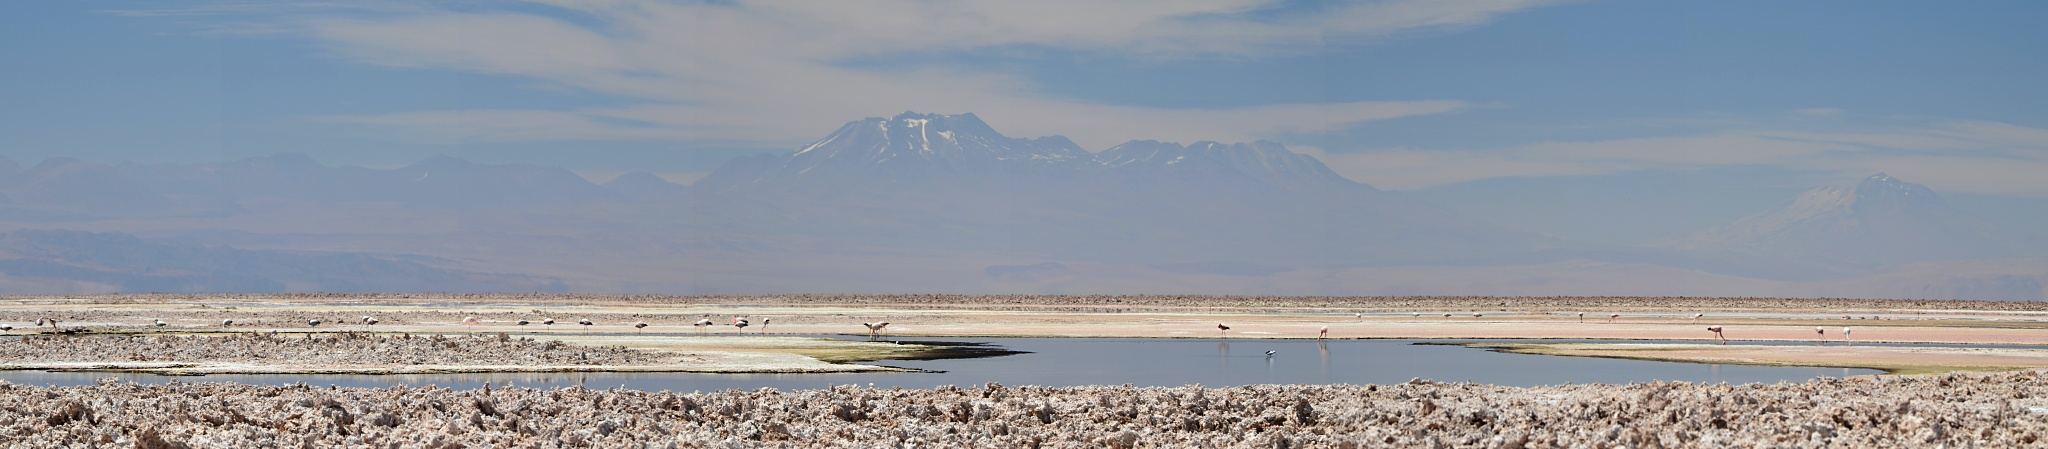 Panoramatický pohled na jezero Chaxa